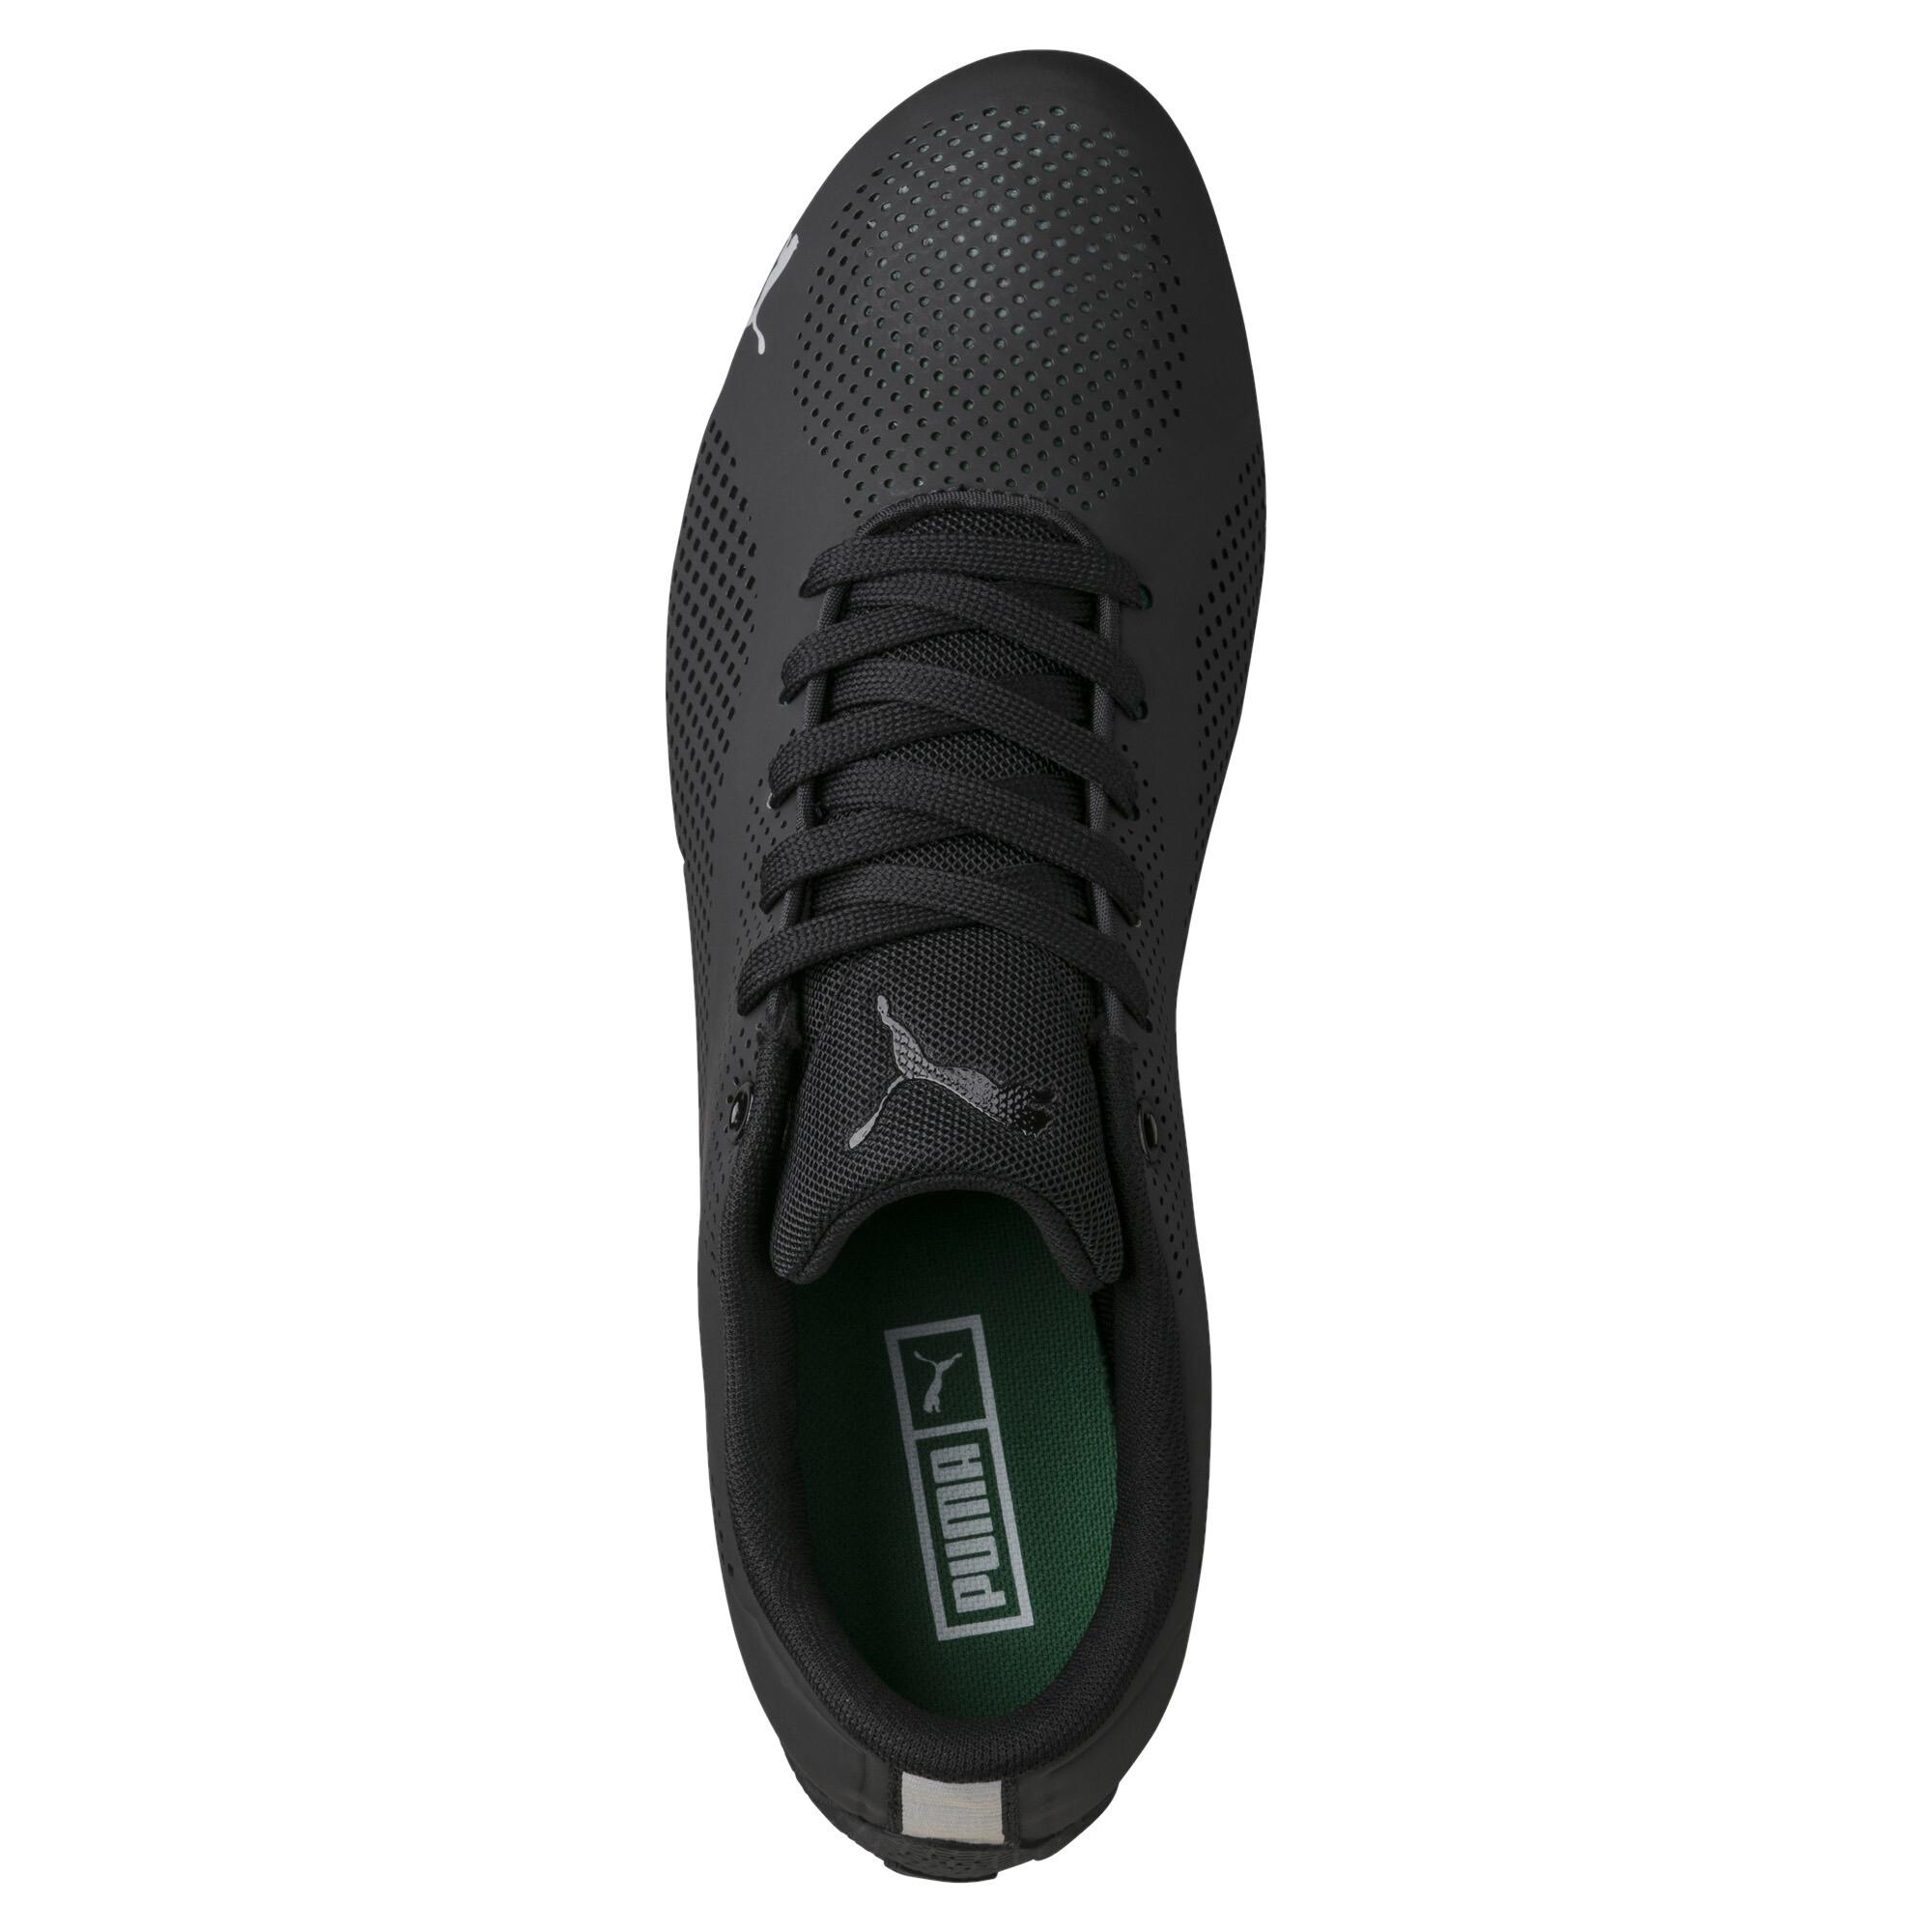 PUMA-Men-039-s-Drift-Cat-Ultra-Reflective-Shoes thumbnail 6